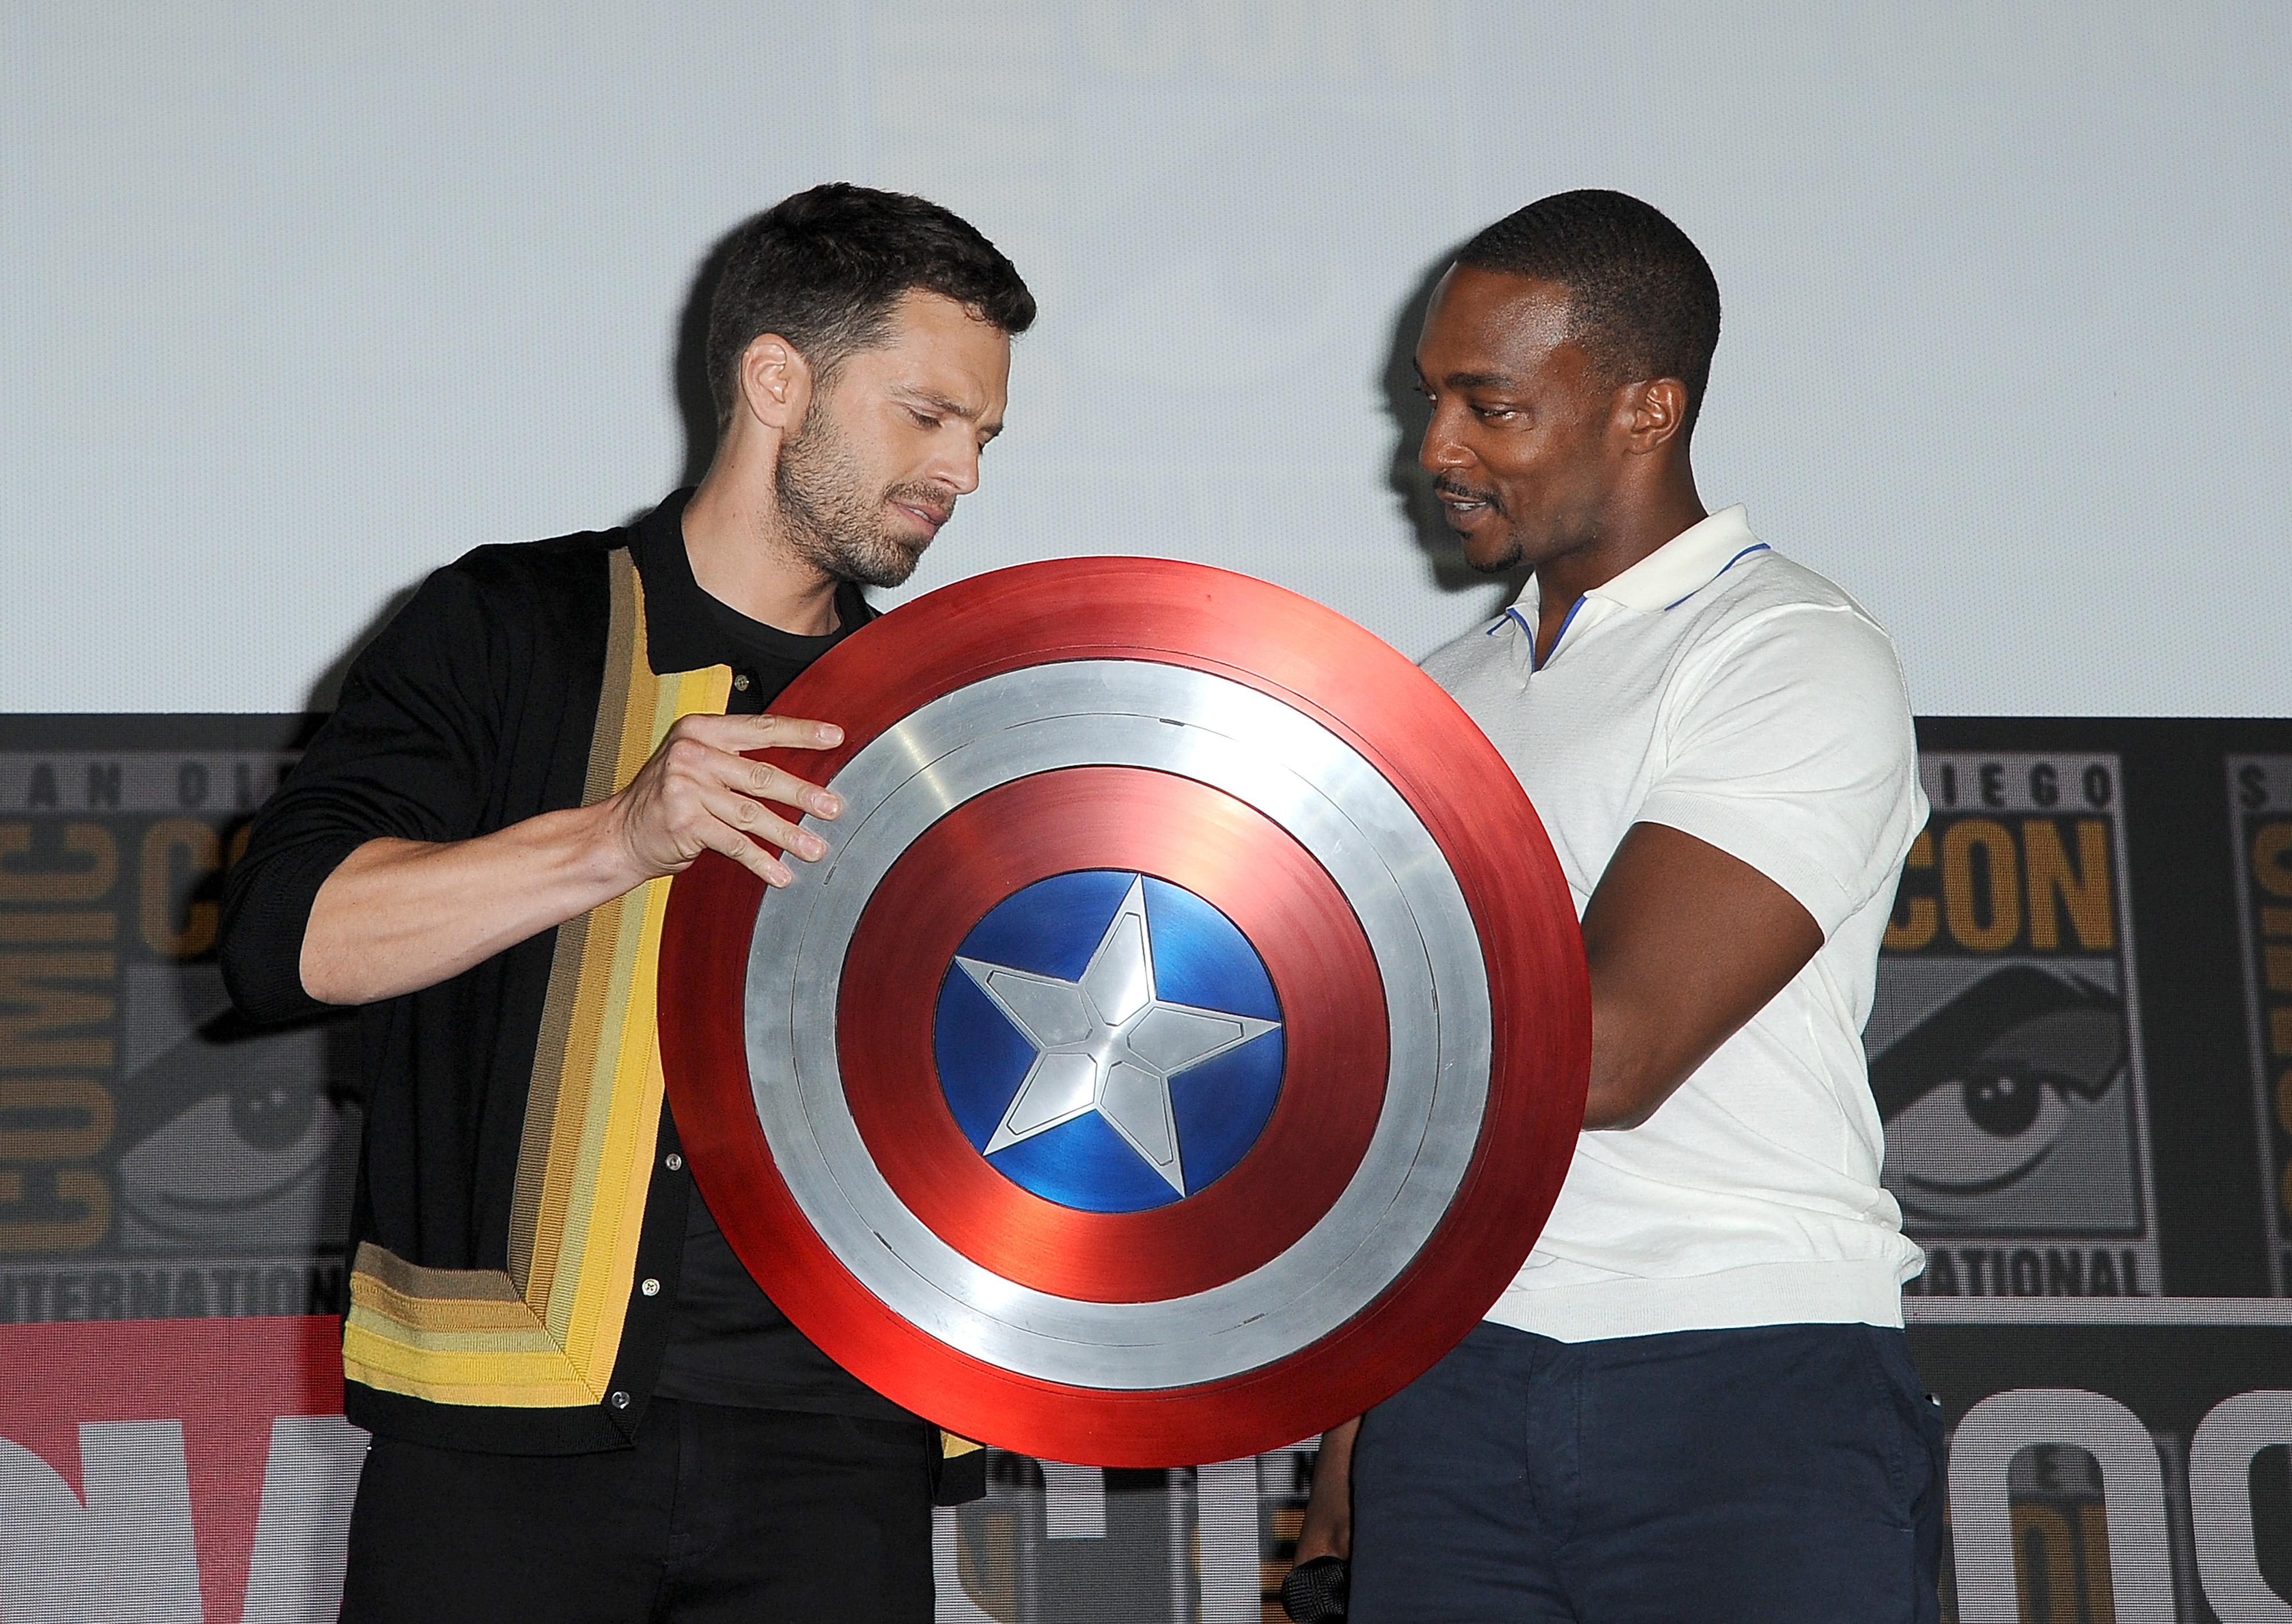 Anthony Mackie and Sebastian Stan